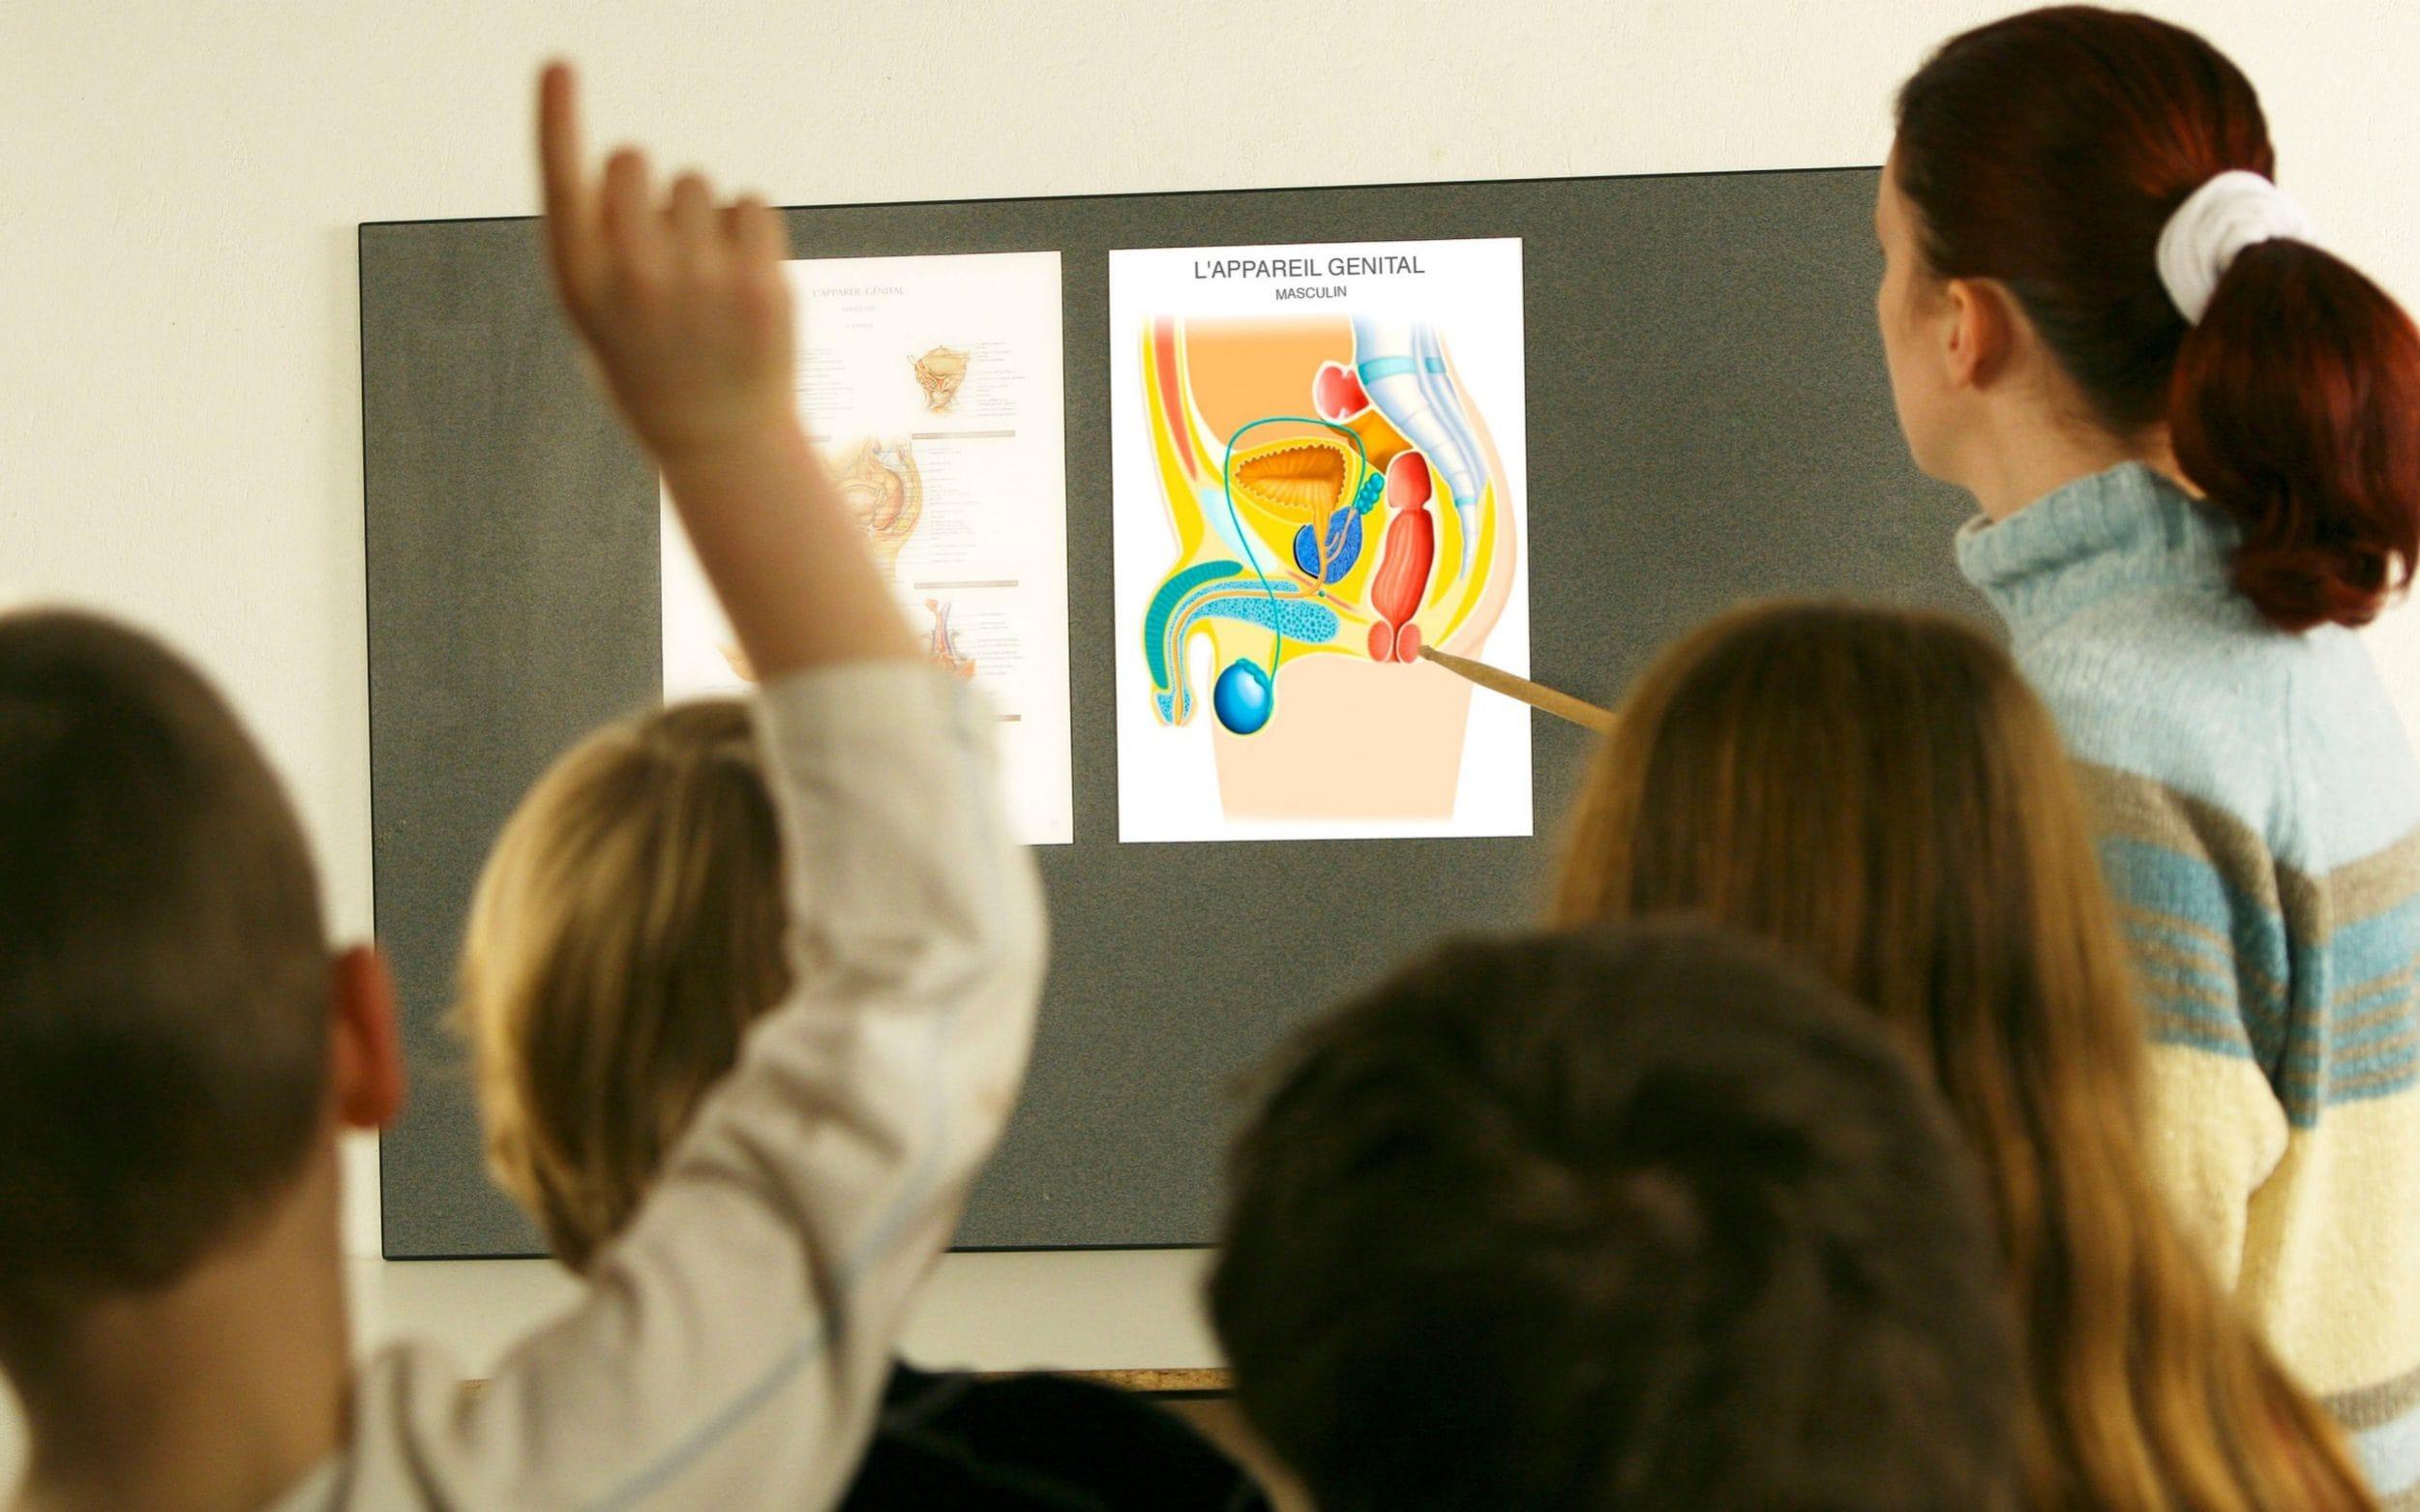 сексуальна освіта